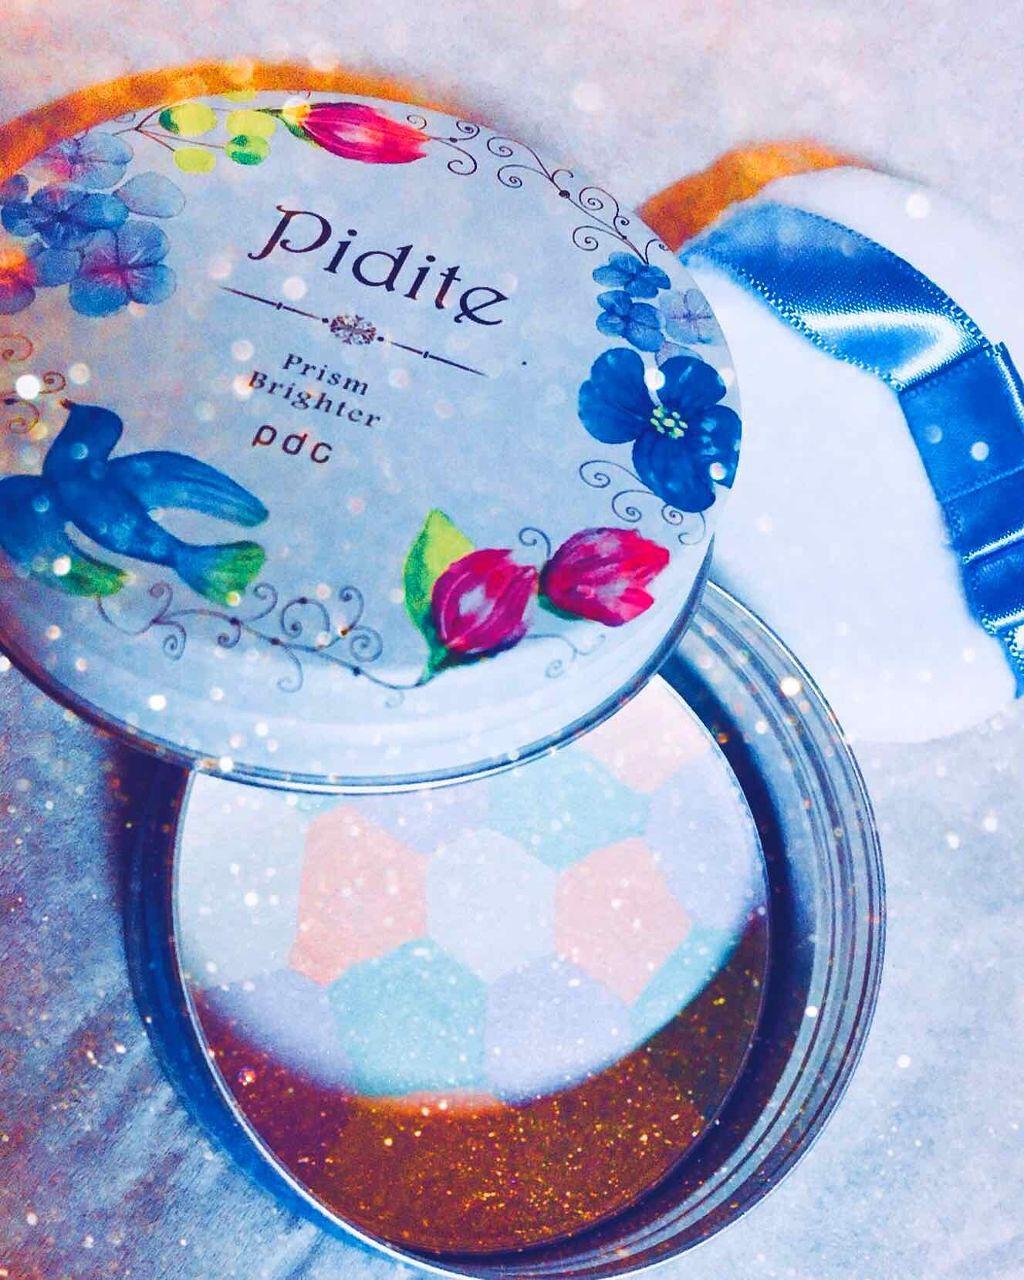 pdc Pidite 幻彩光透蜜粉餅